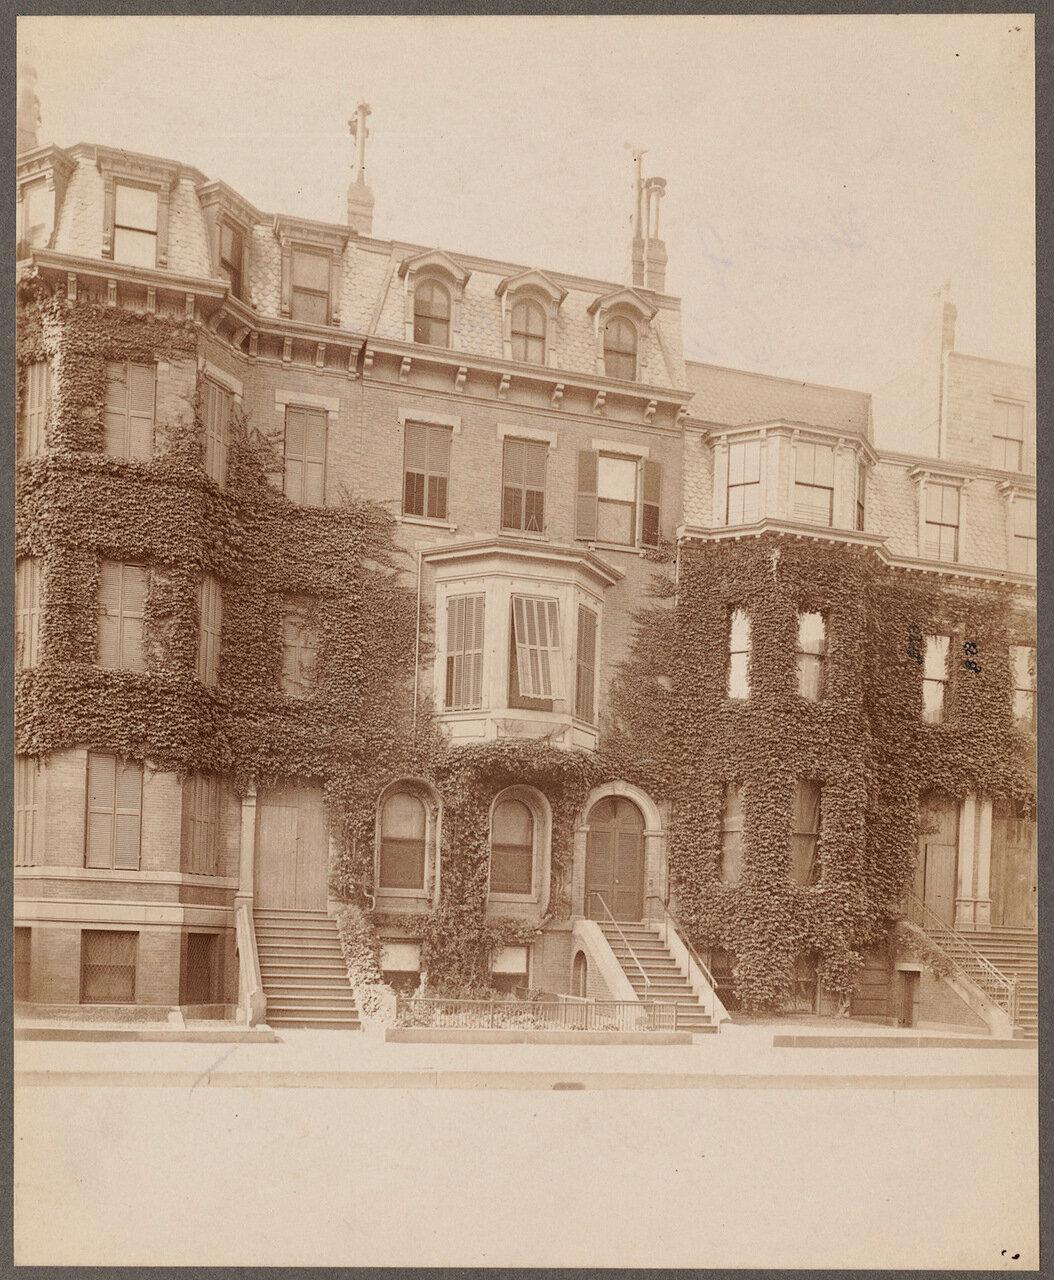 1870 - 1895